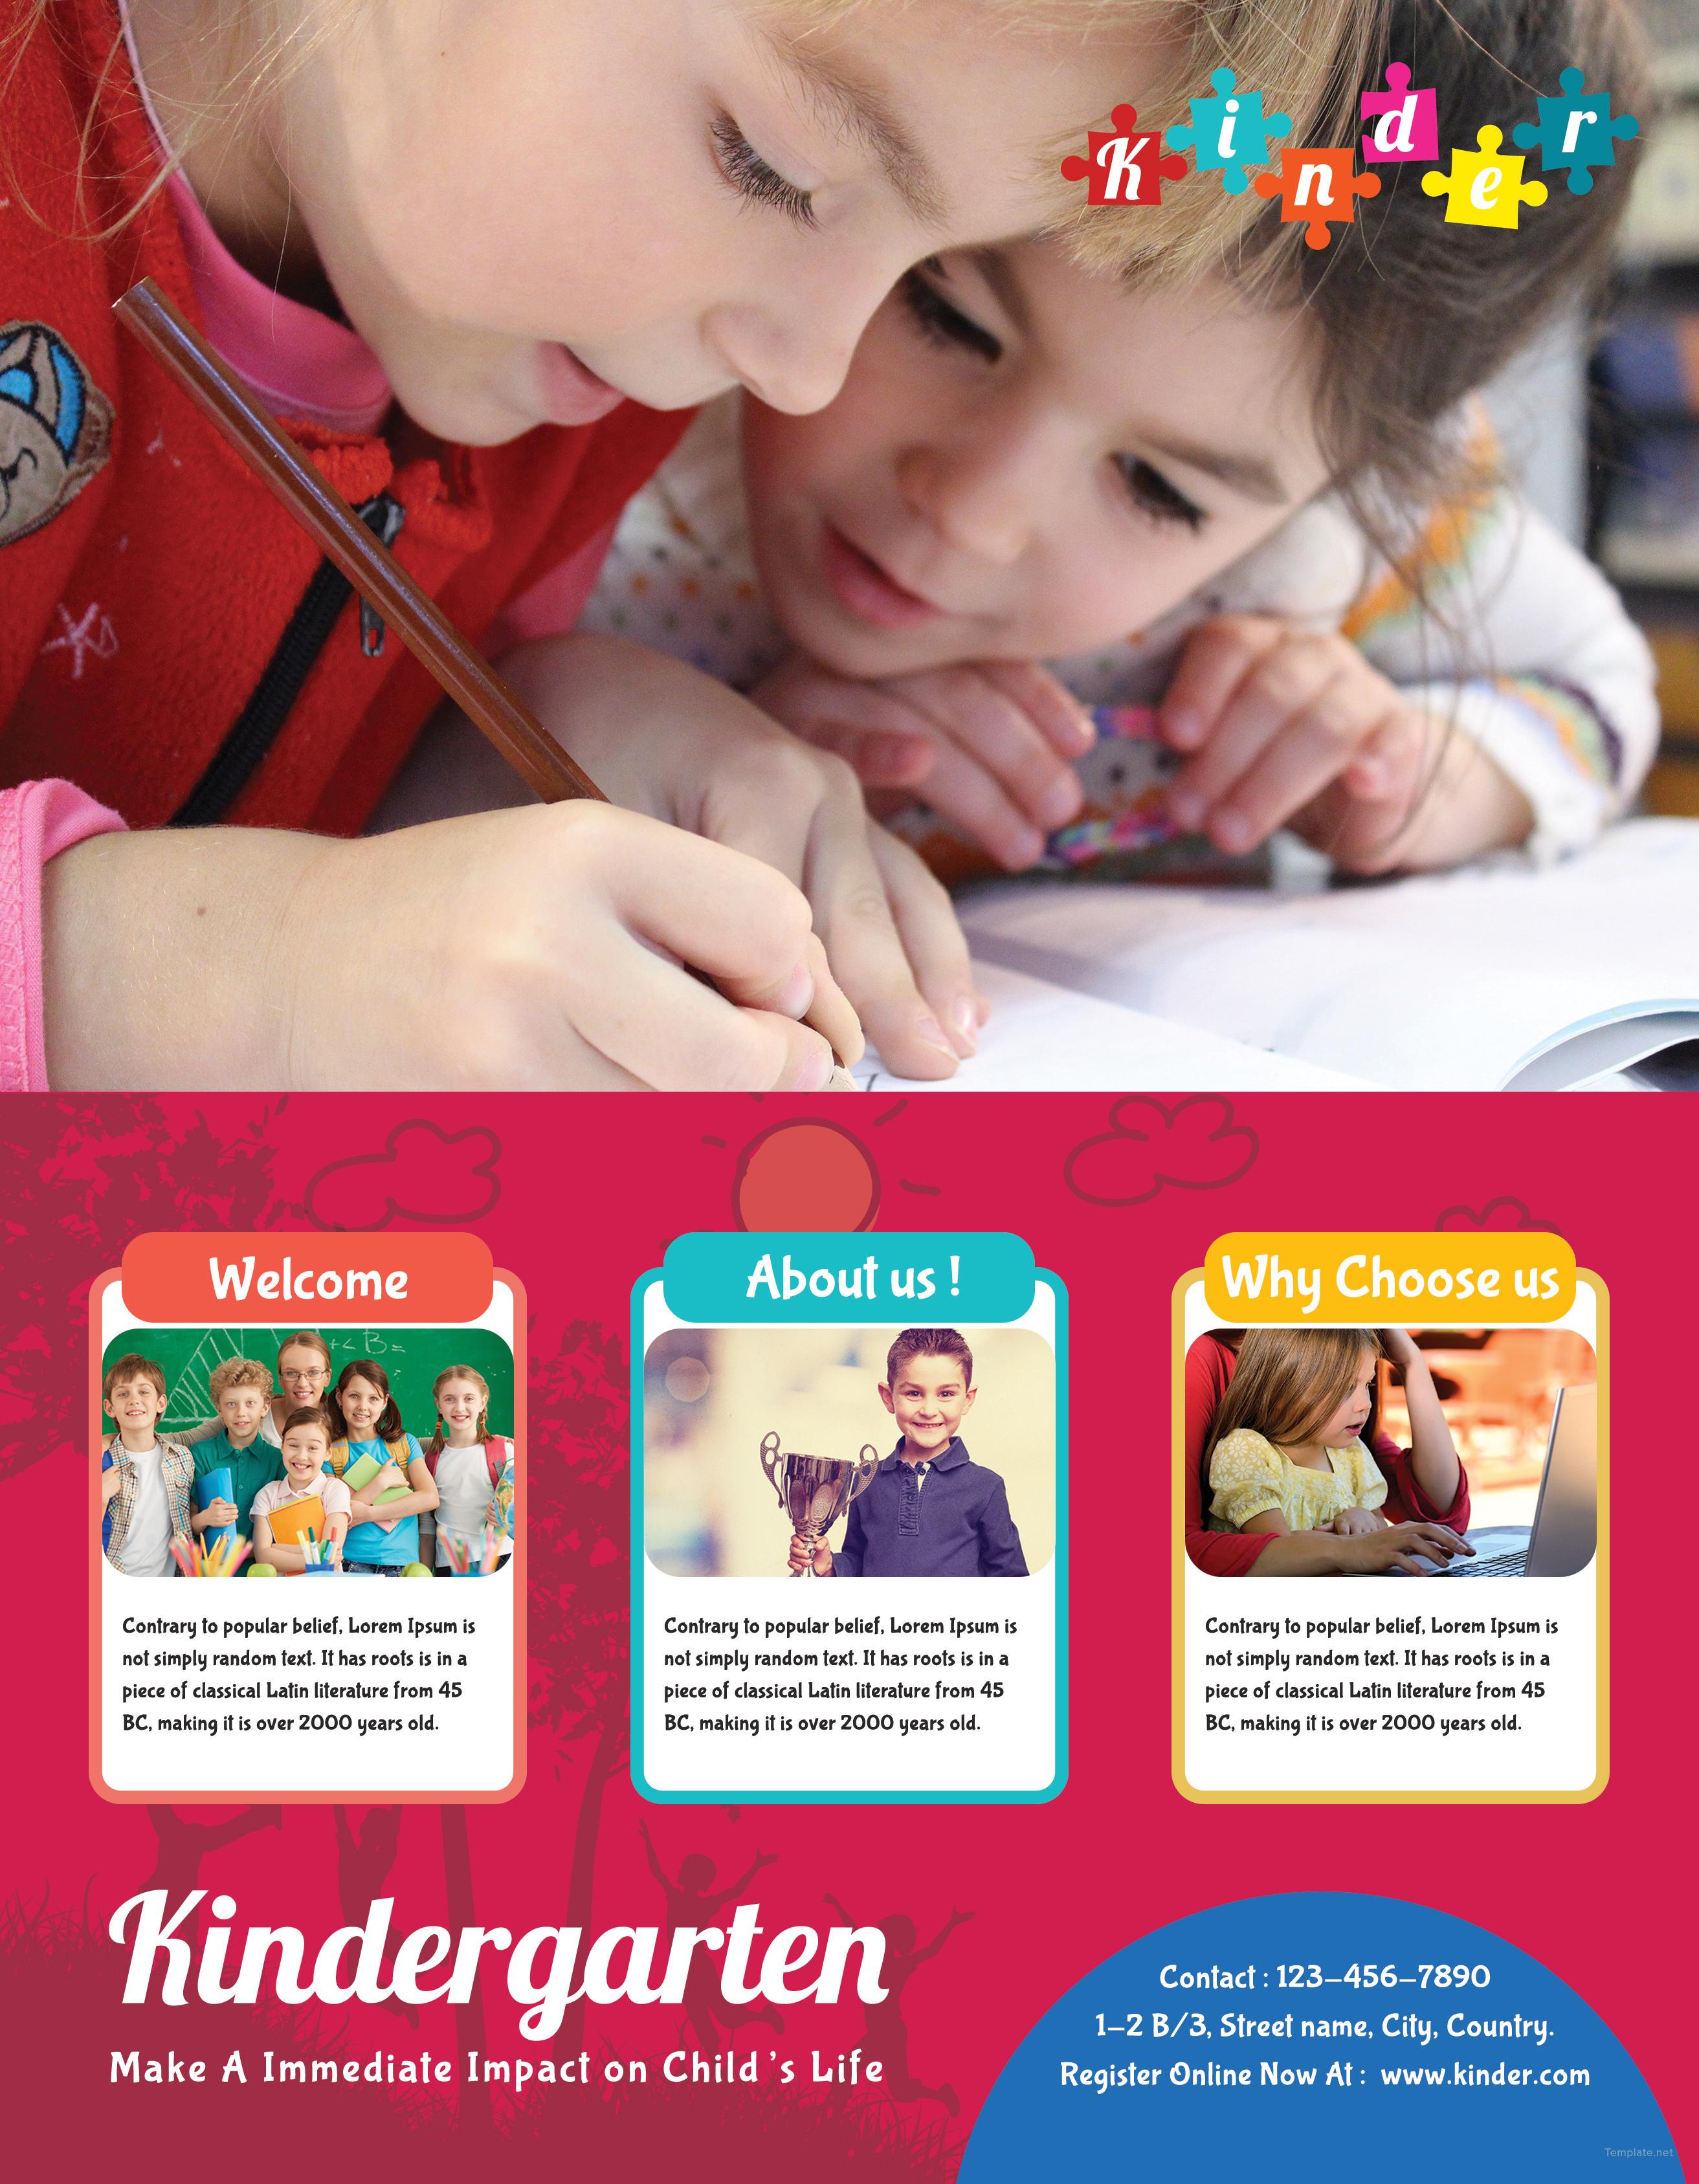 Free kindergarten flyer template in adobe photoshop illustrator click to see full template kindergarten flyer saigontimesfo